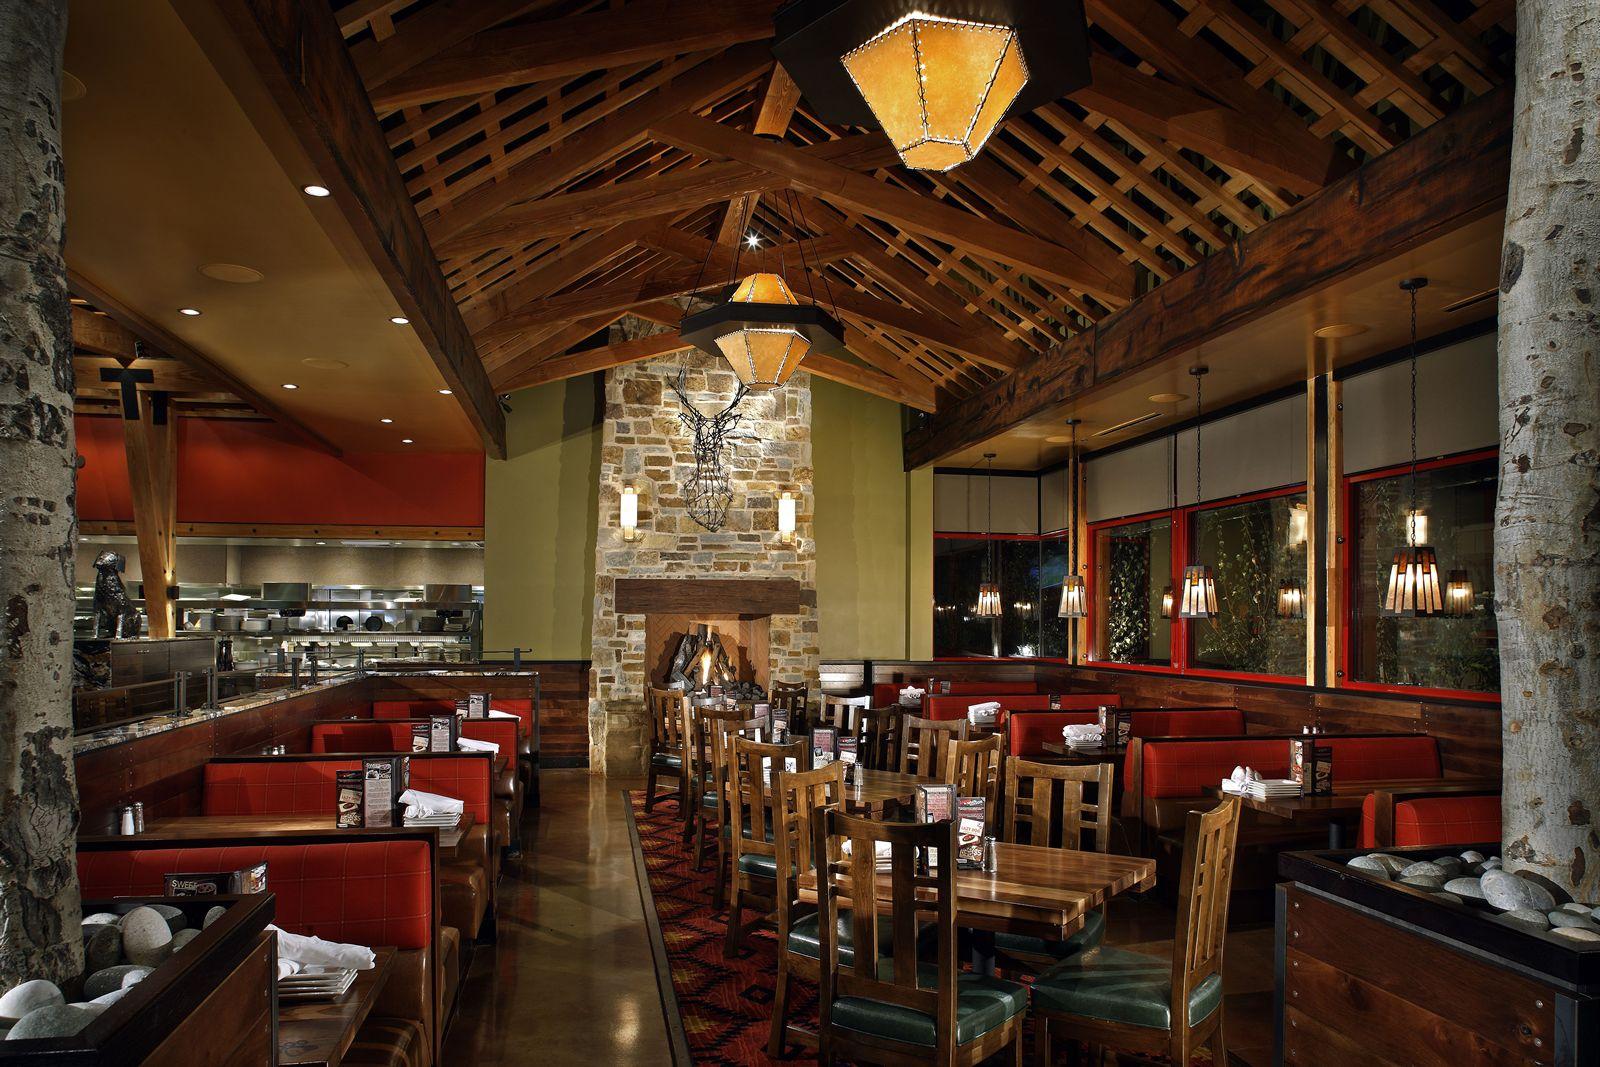 Lazy Dog Restaurant & Bar To Open in Fairfax County, VA